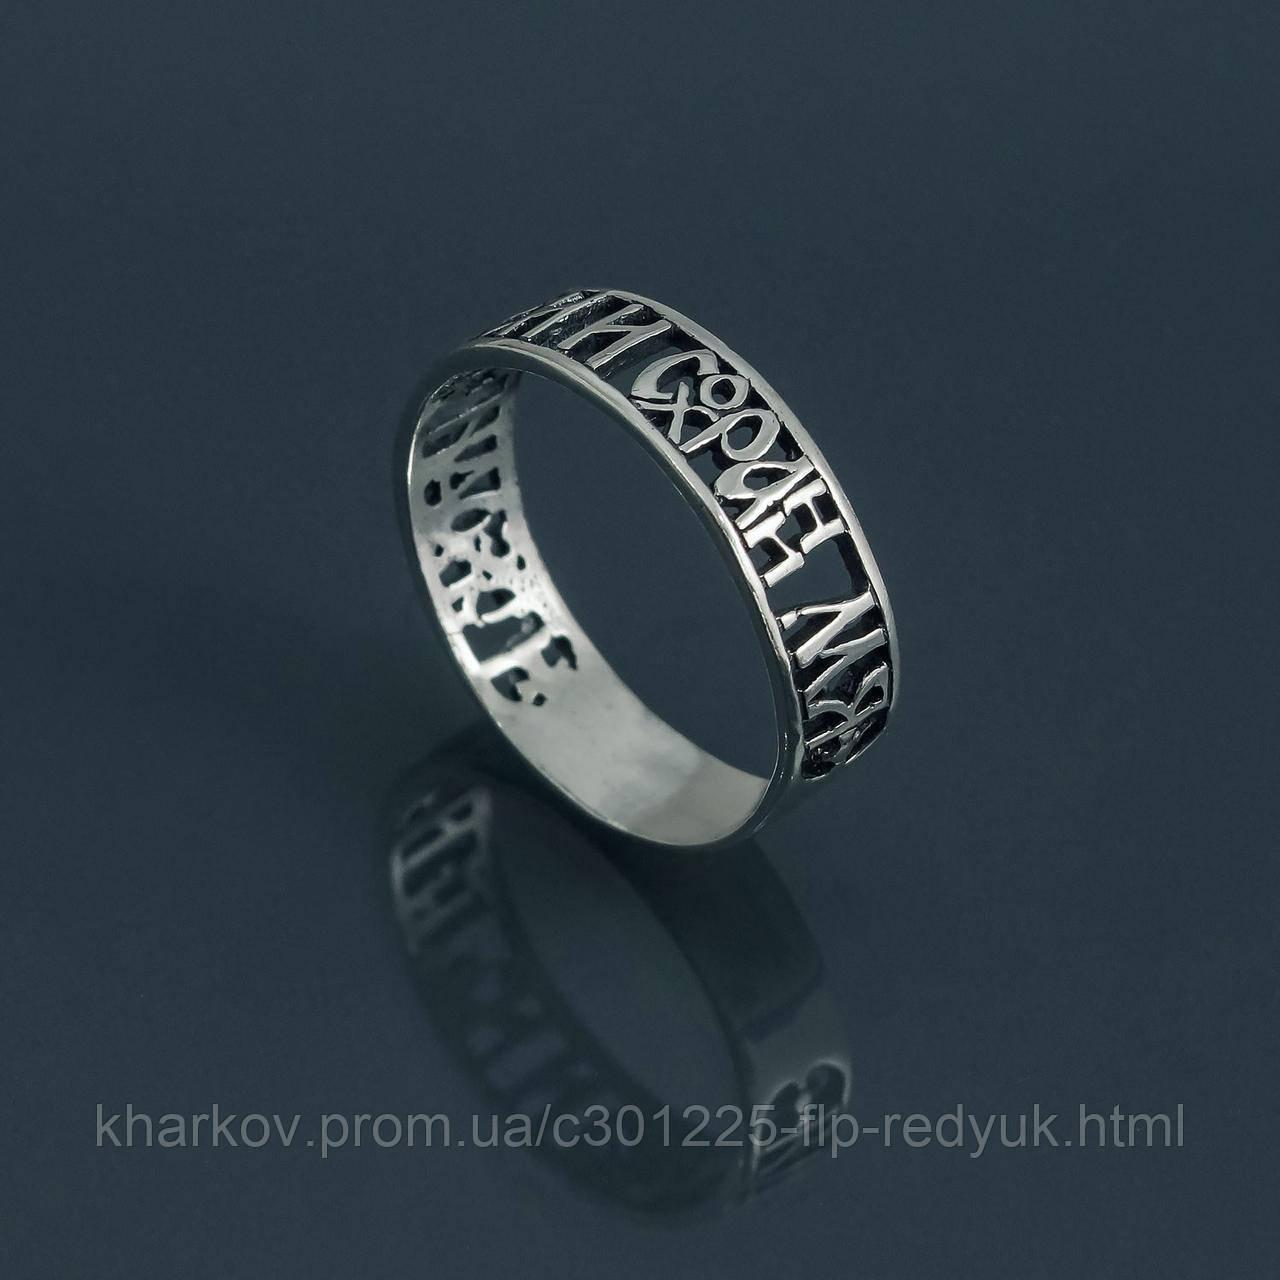 Серебряное кольцо Церковное ажурное